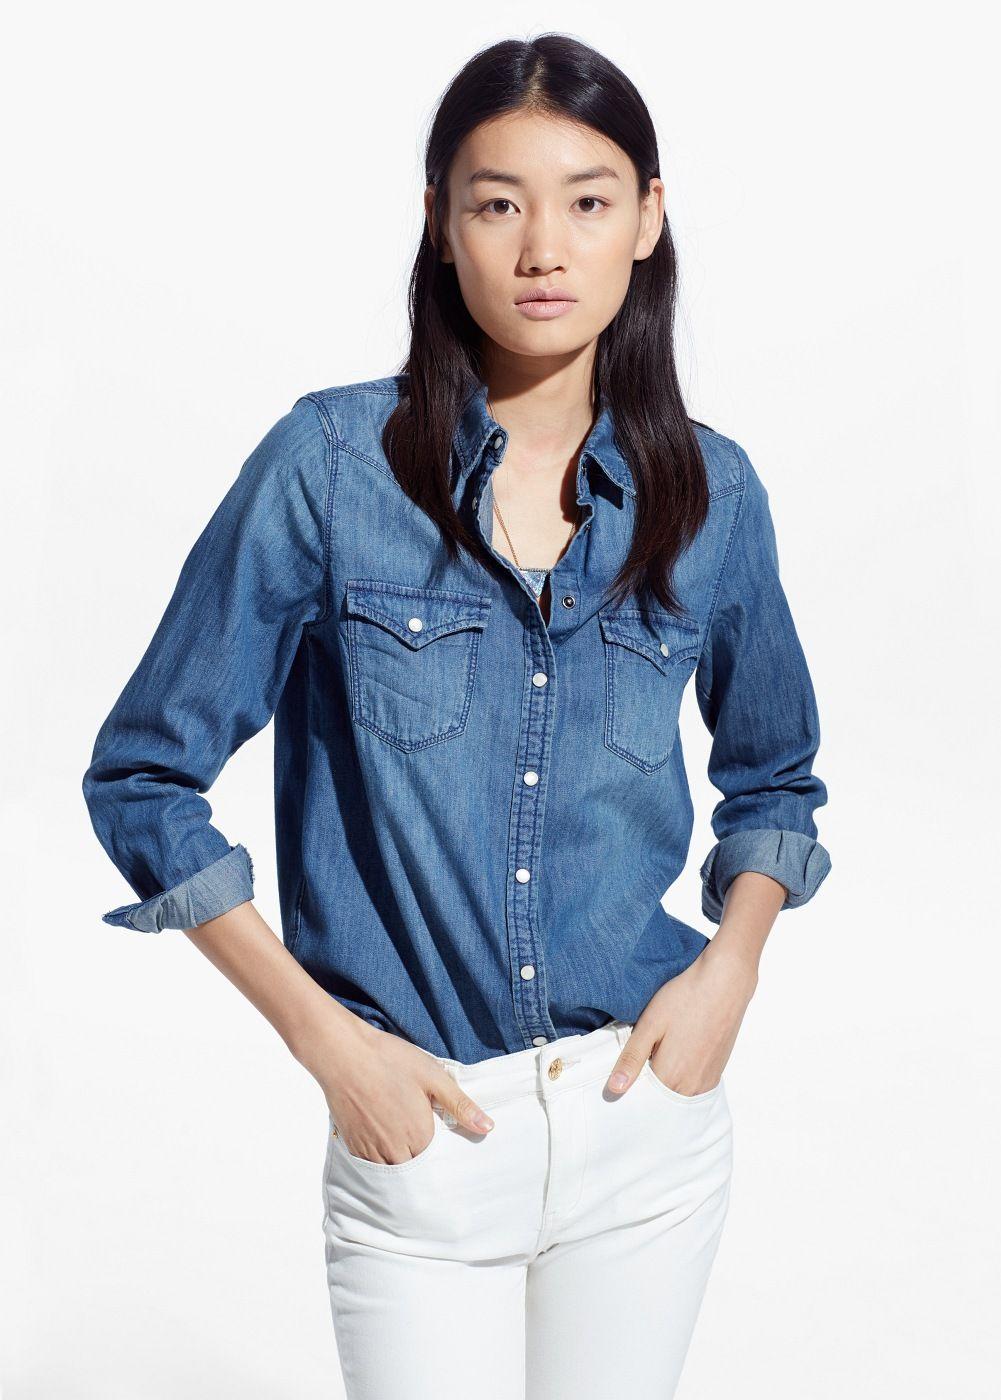 a75c6de6ab5 Medium denim shirt - Woman